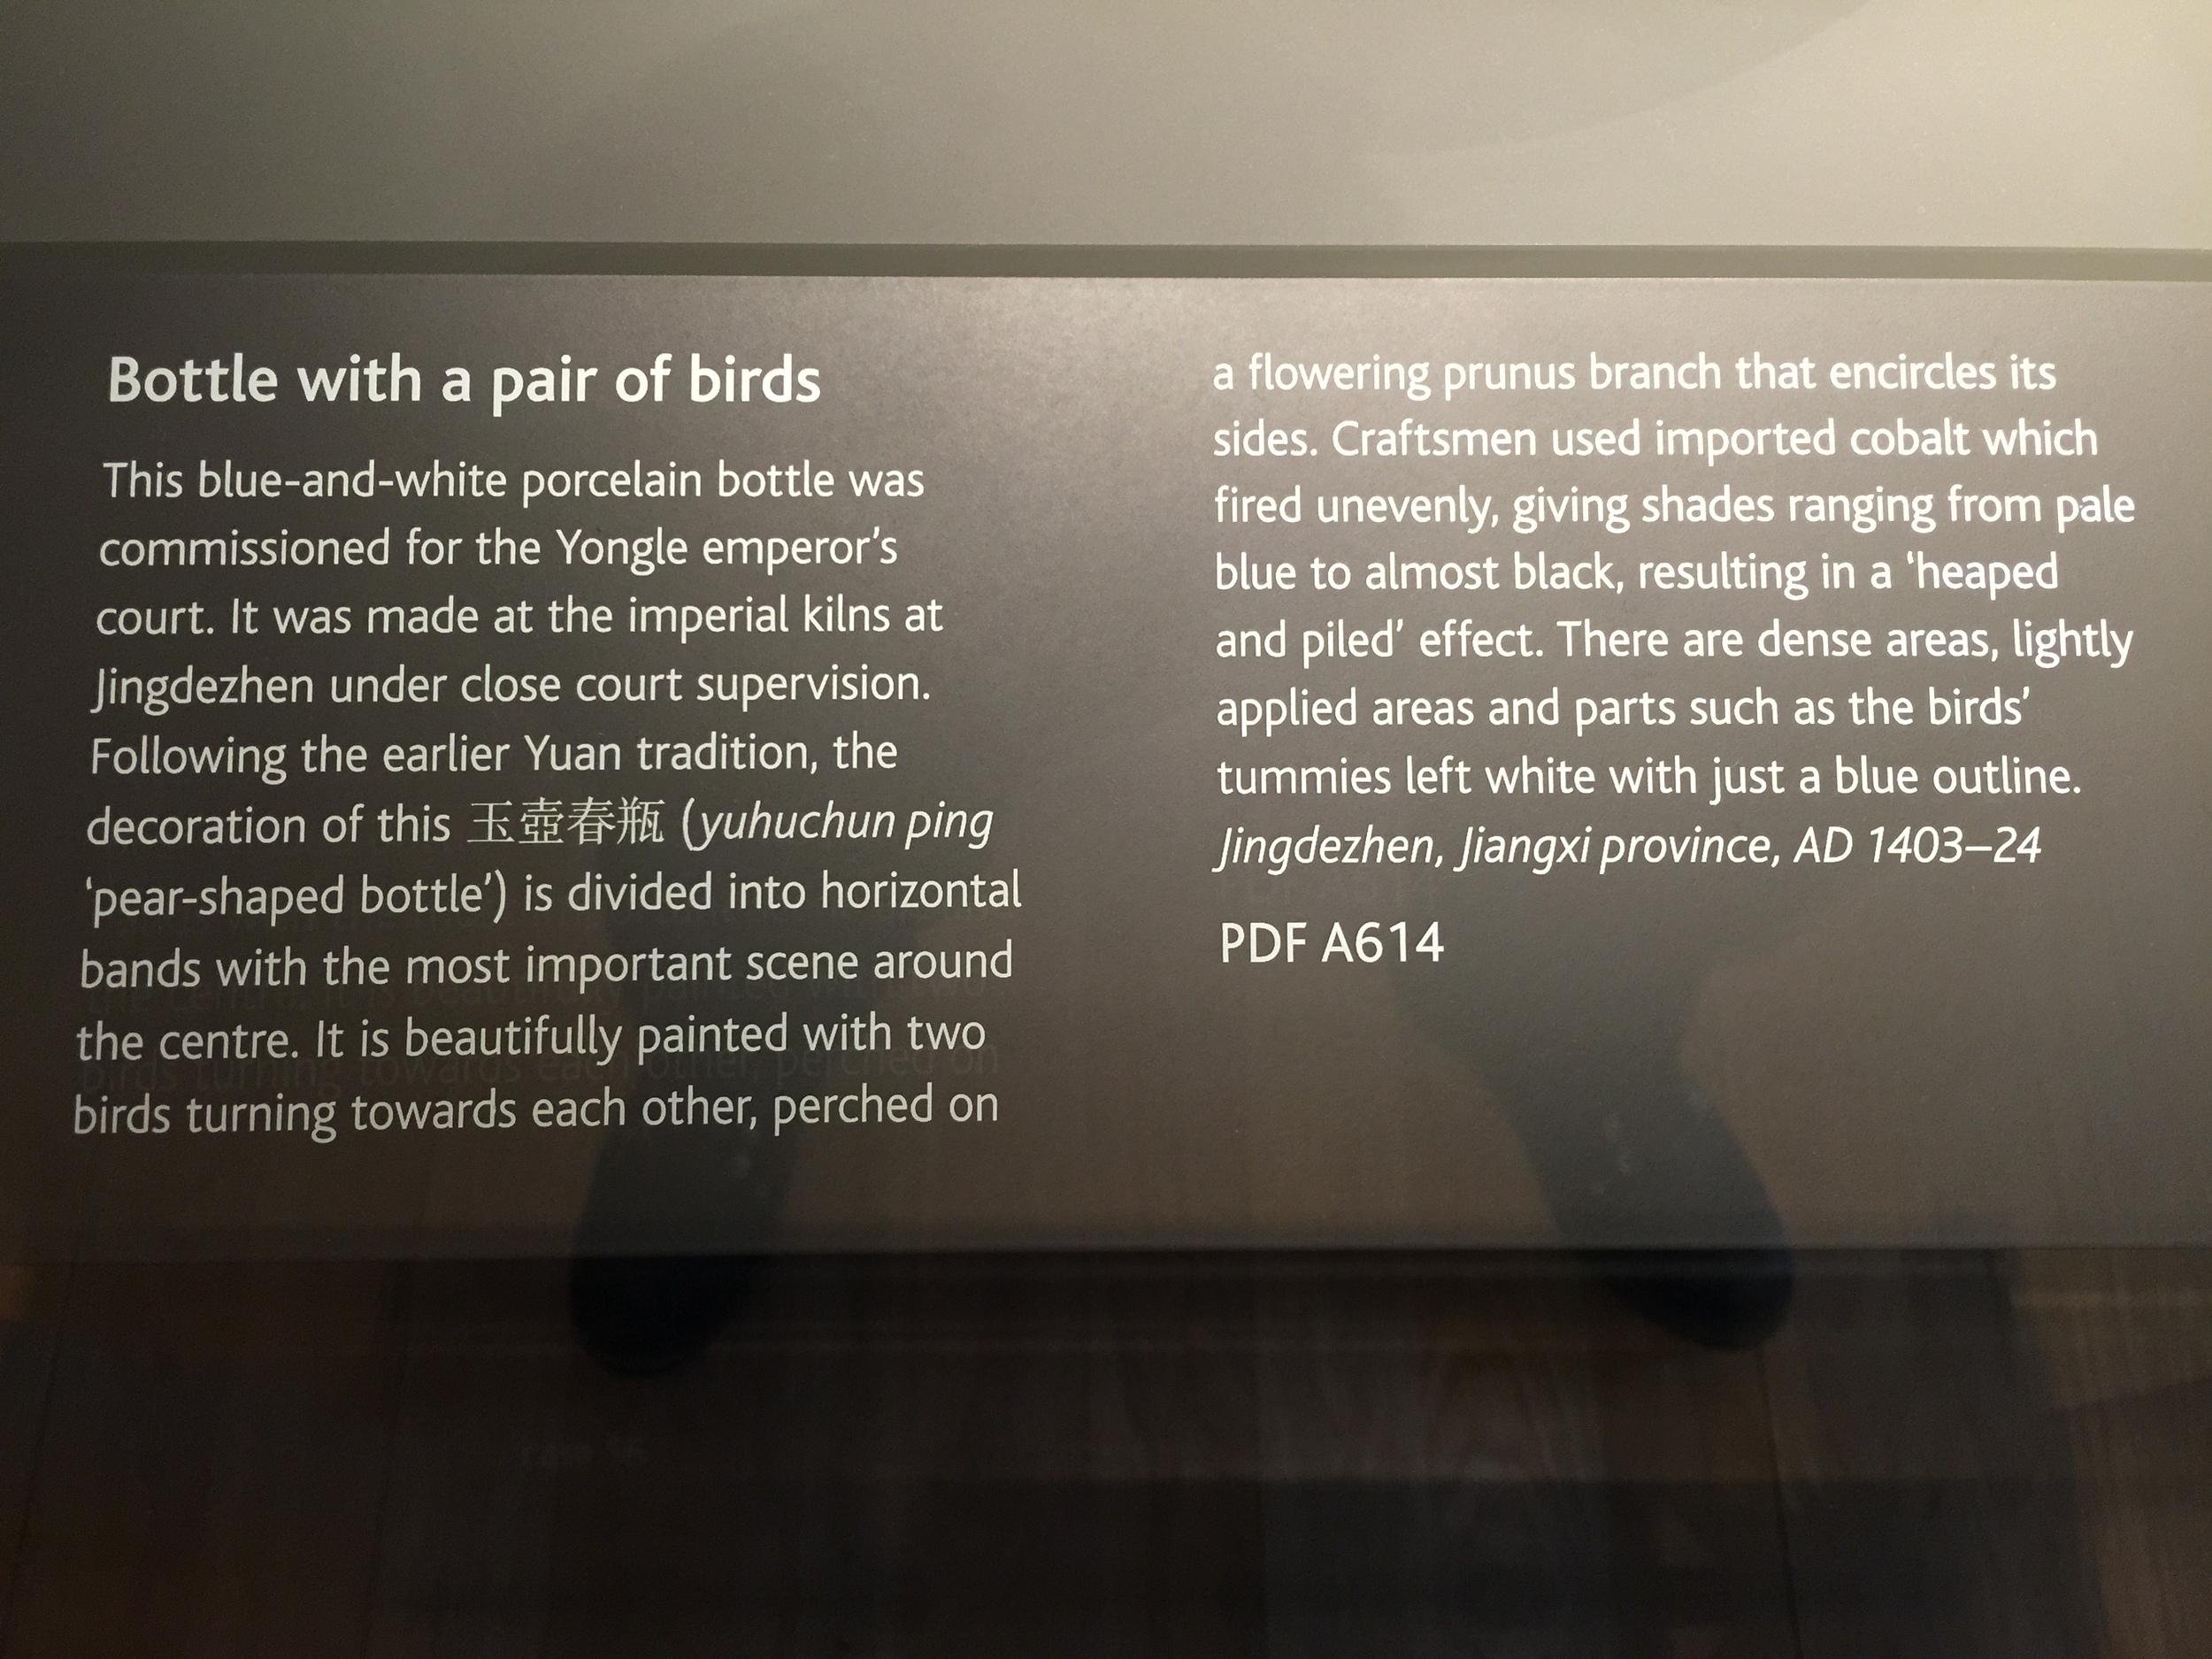 Chinese-Porcelain-British-Museum-Percival-David-jessewaugh.com-43.jpg